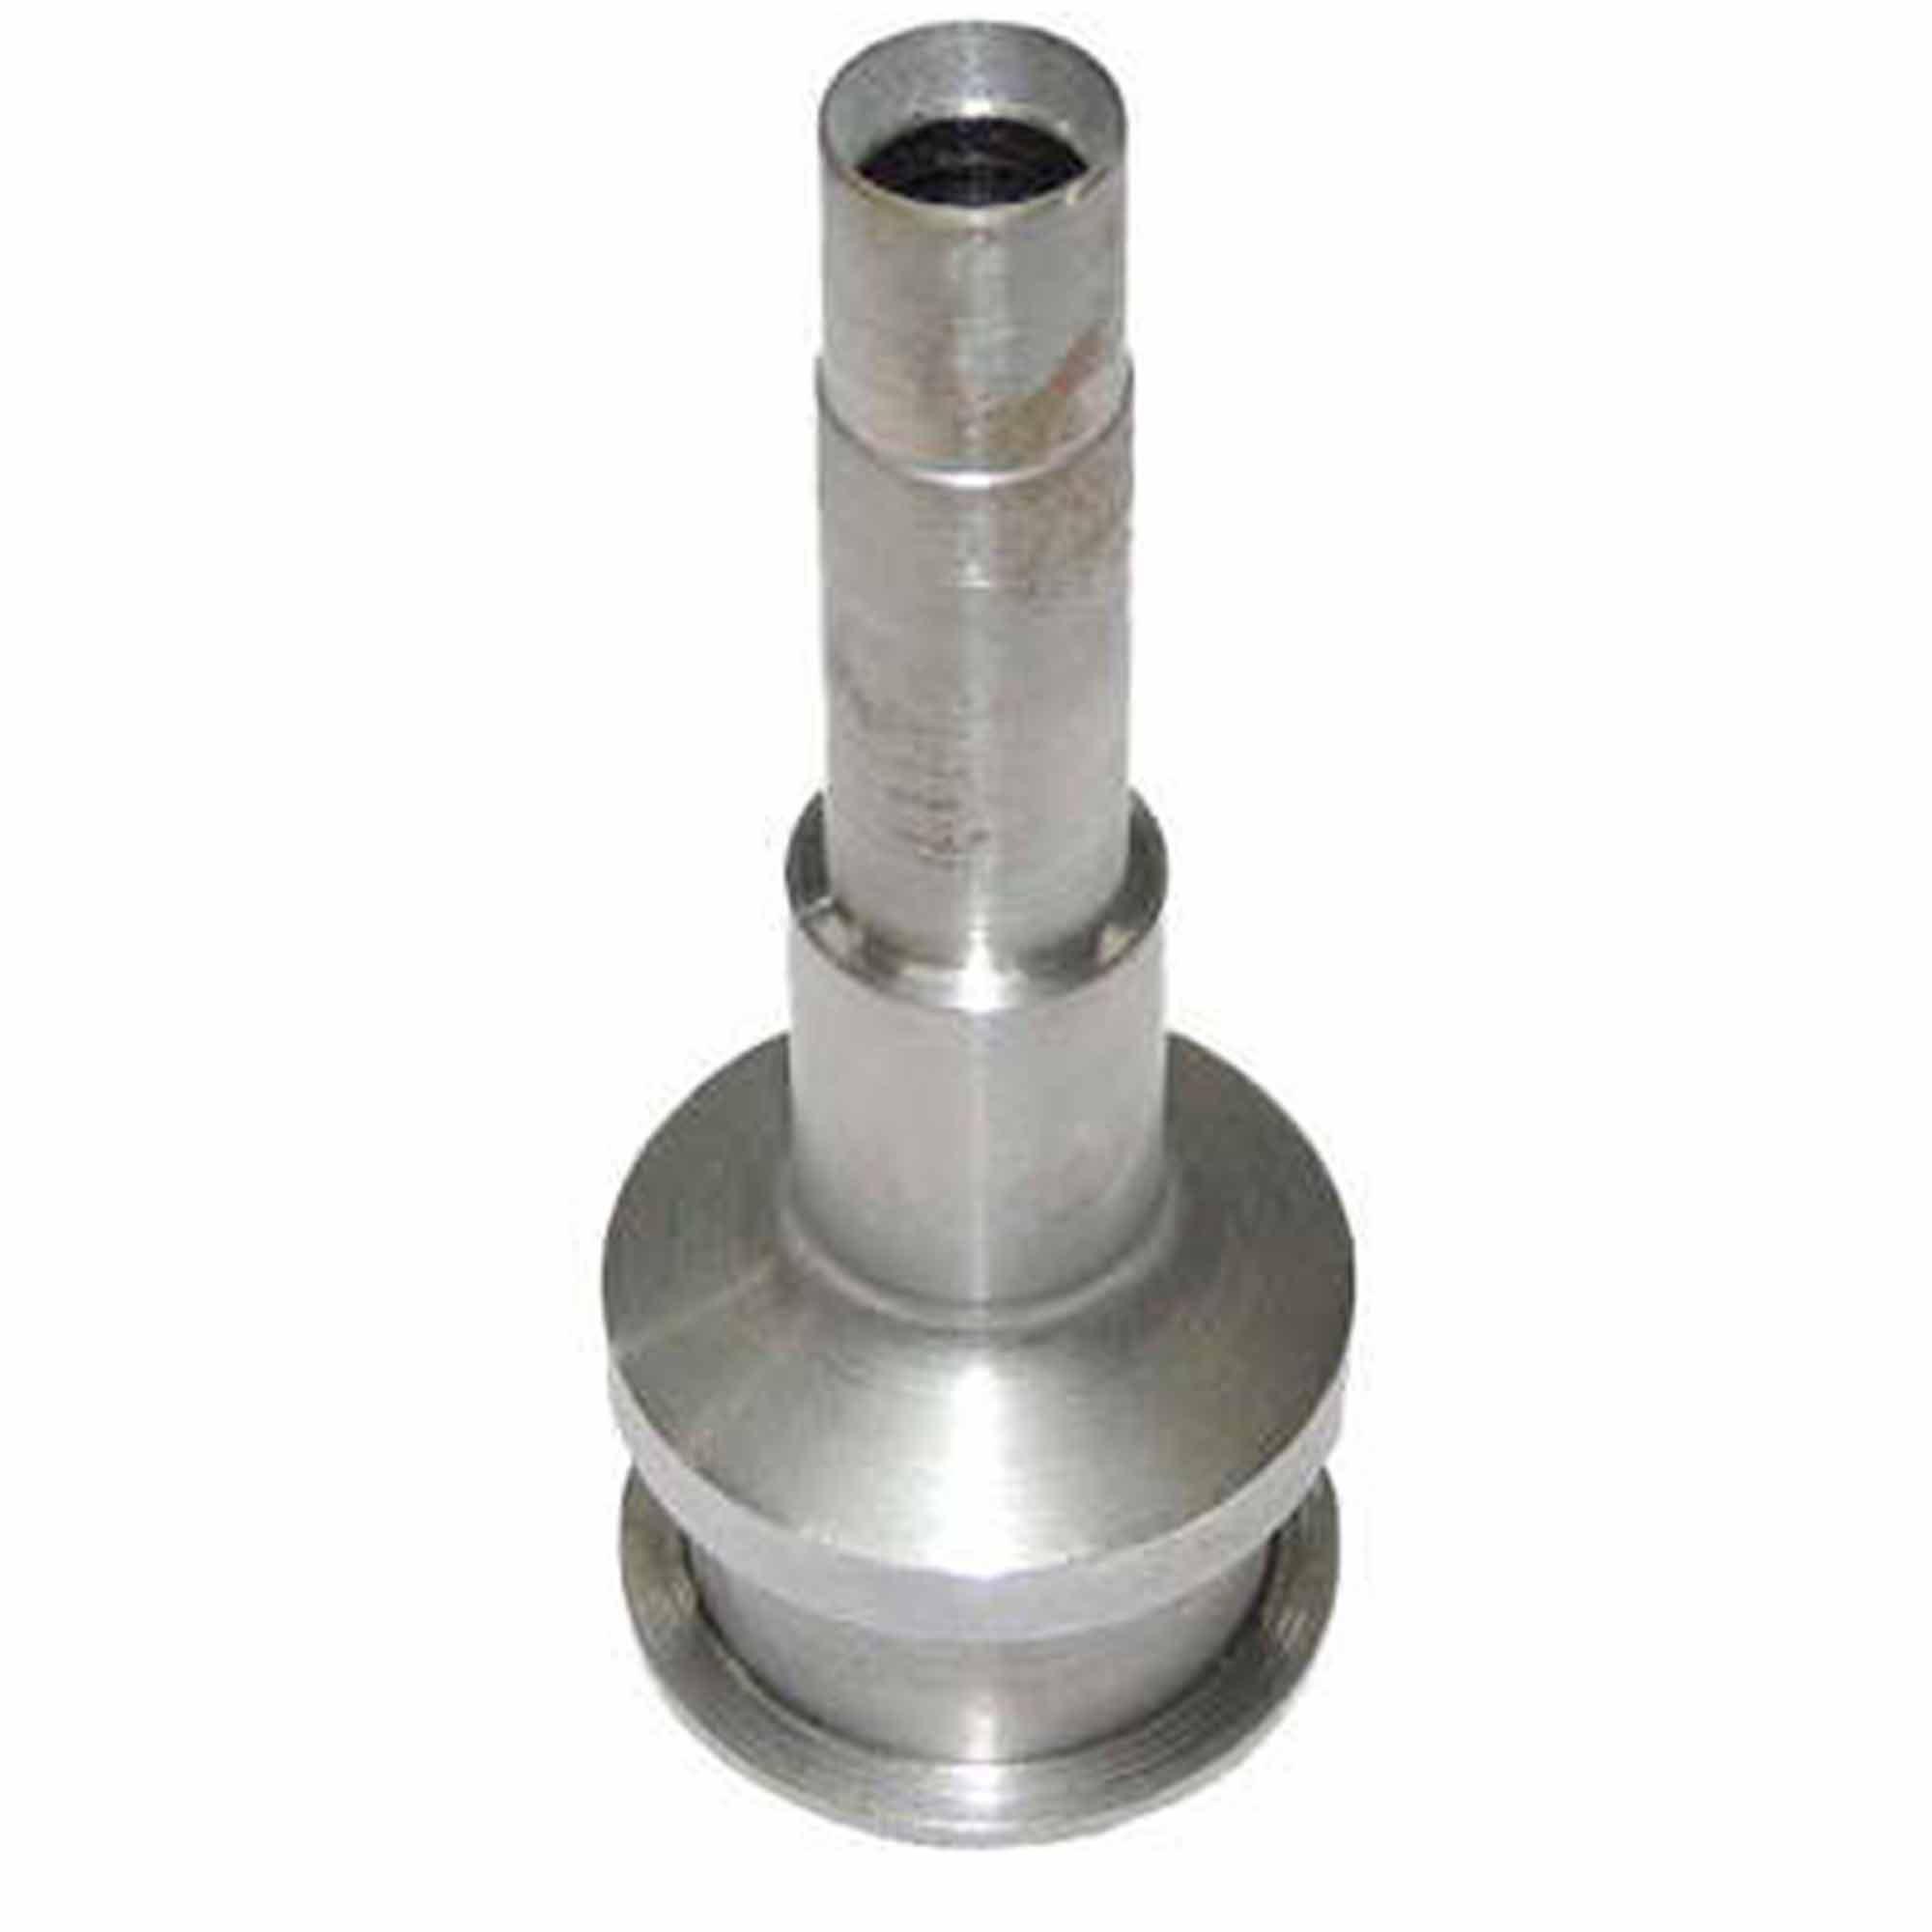 SUK493 - Conector do tubo da vareta medidora do nível de óleo